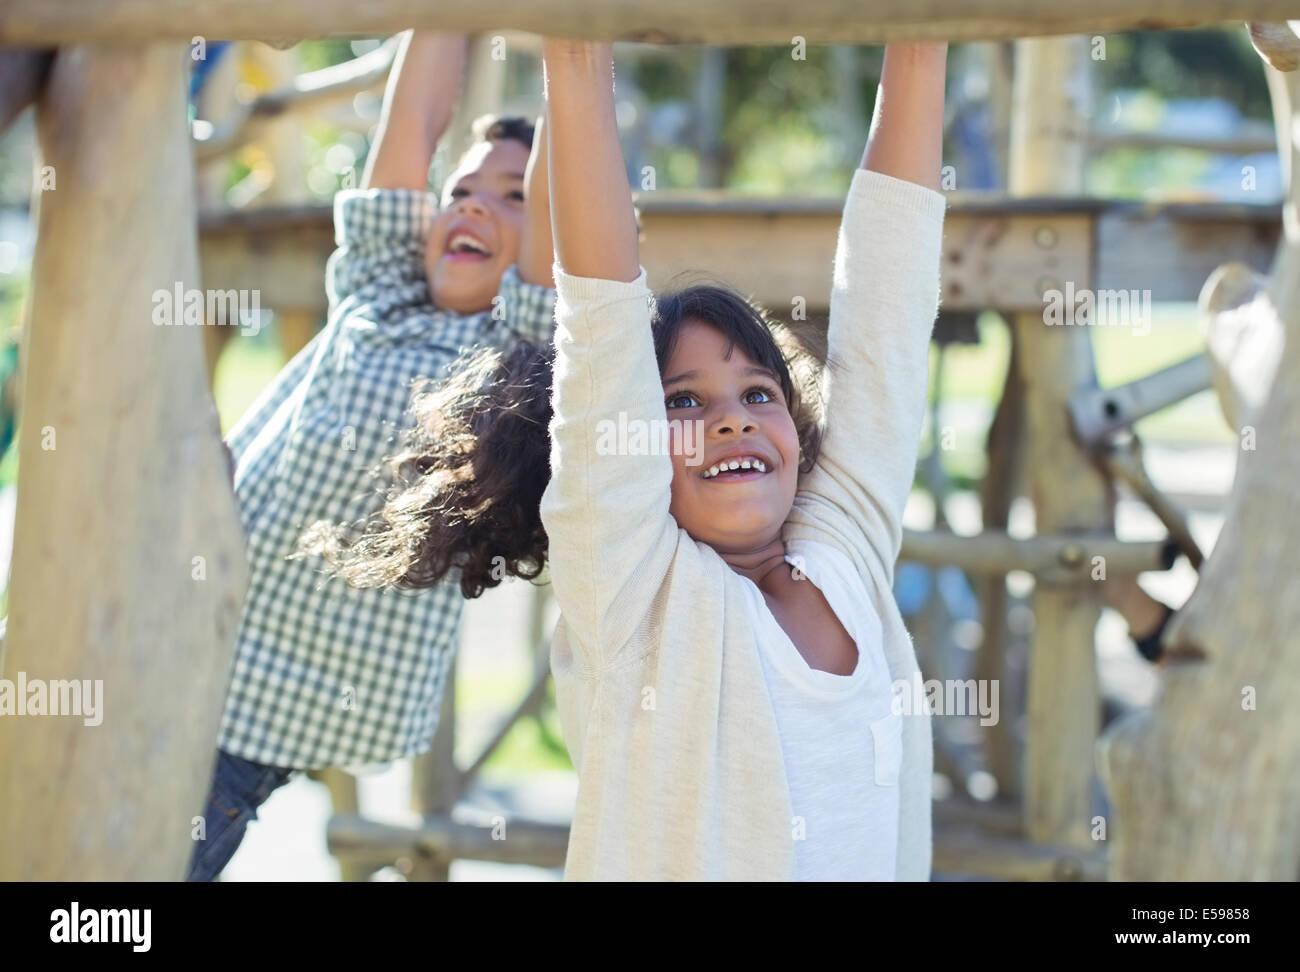 Kinder klettern auf Klettergerüst Stockbild